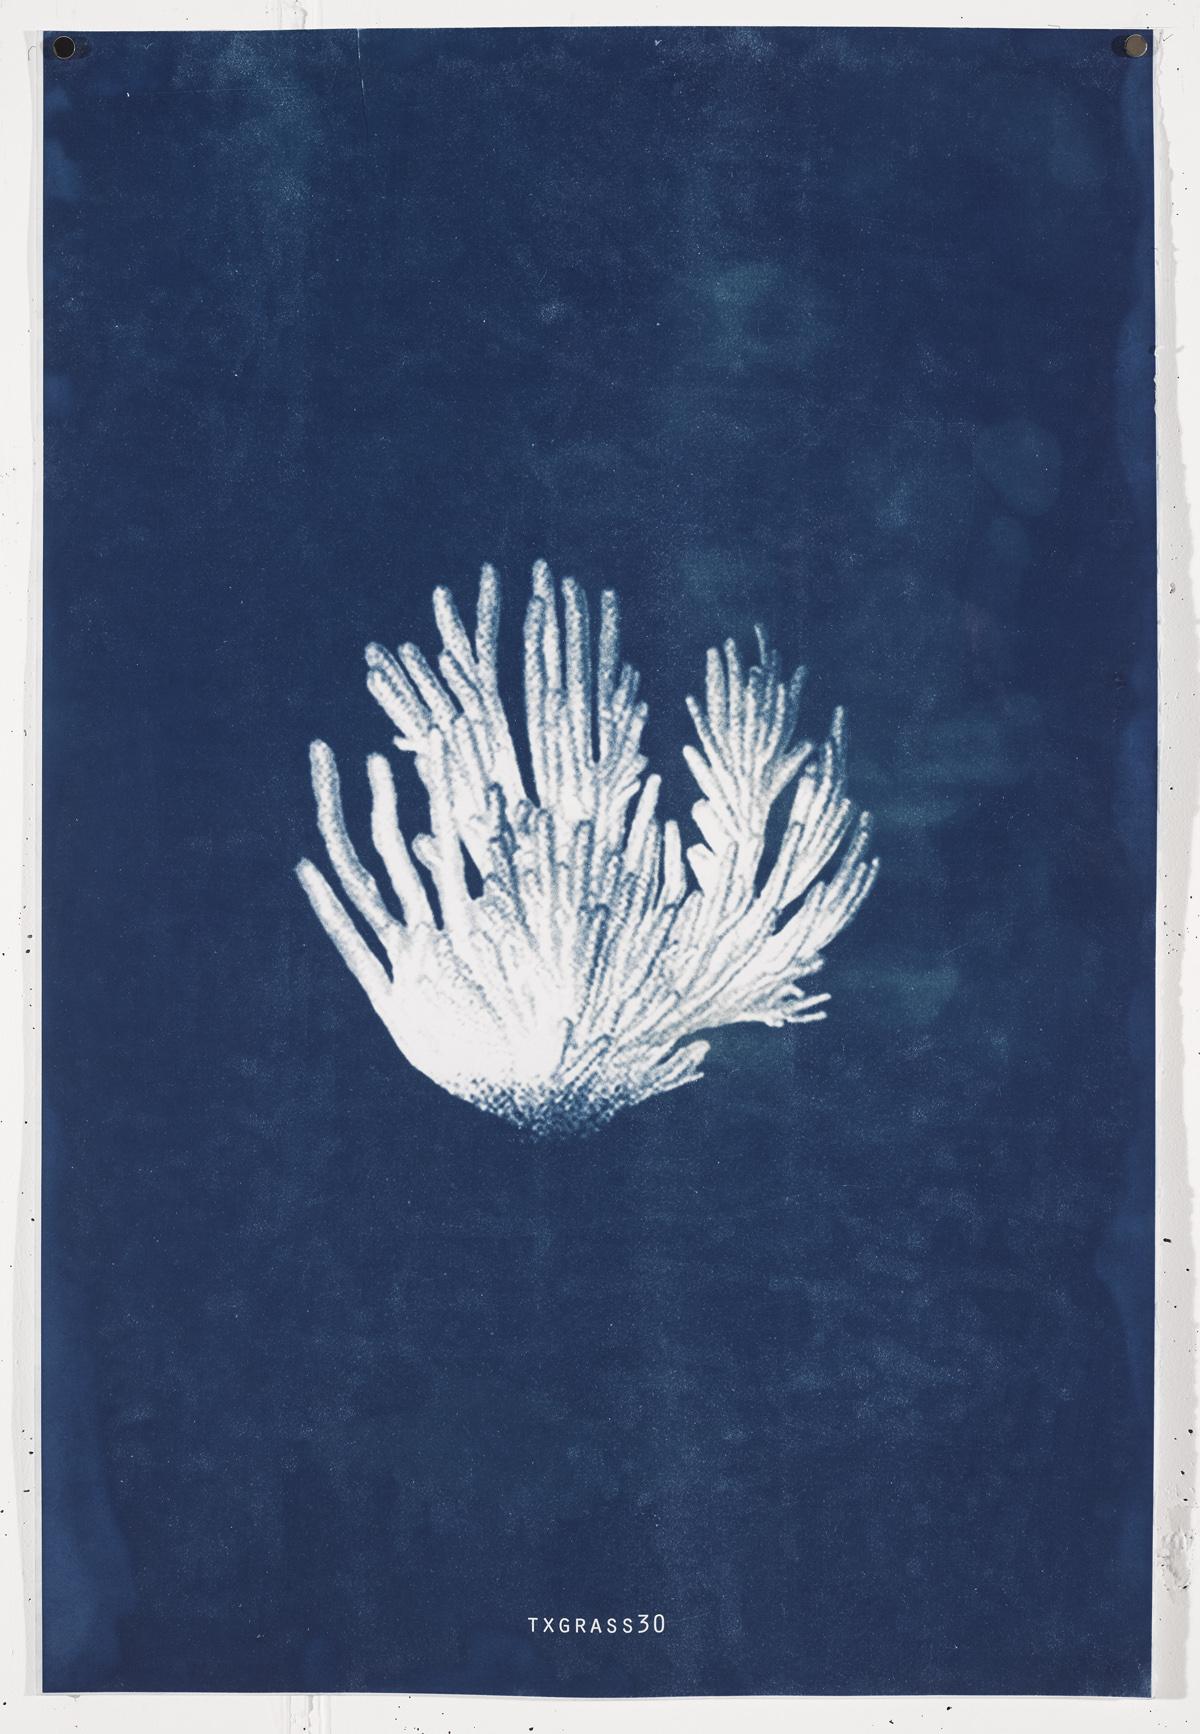 TXGRASS 2017 Unique cyanotype print on Frabriano No.5.90.4cm x 61cm